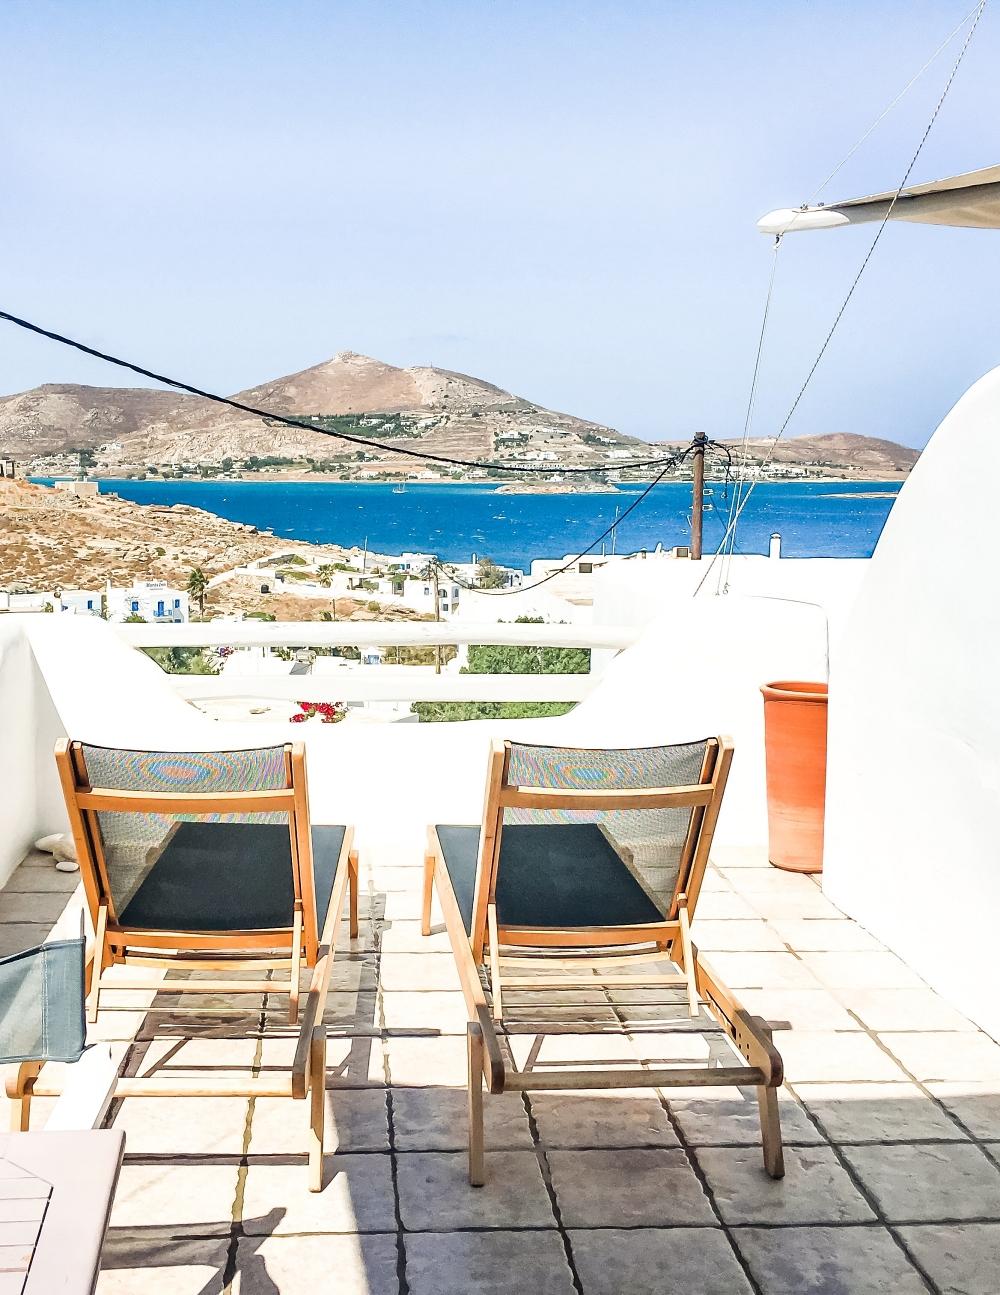 Yades suites apartments and spa Naousa Paros, Paros island best hotels